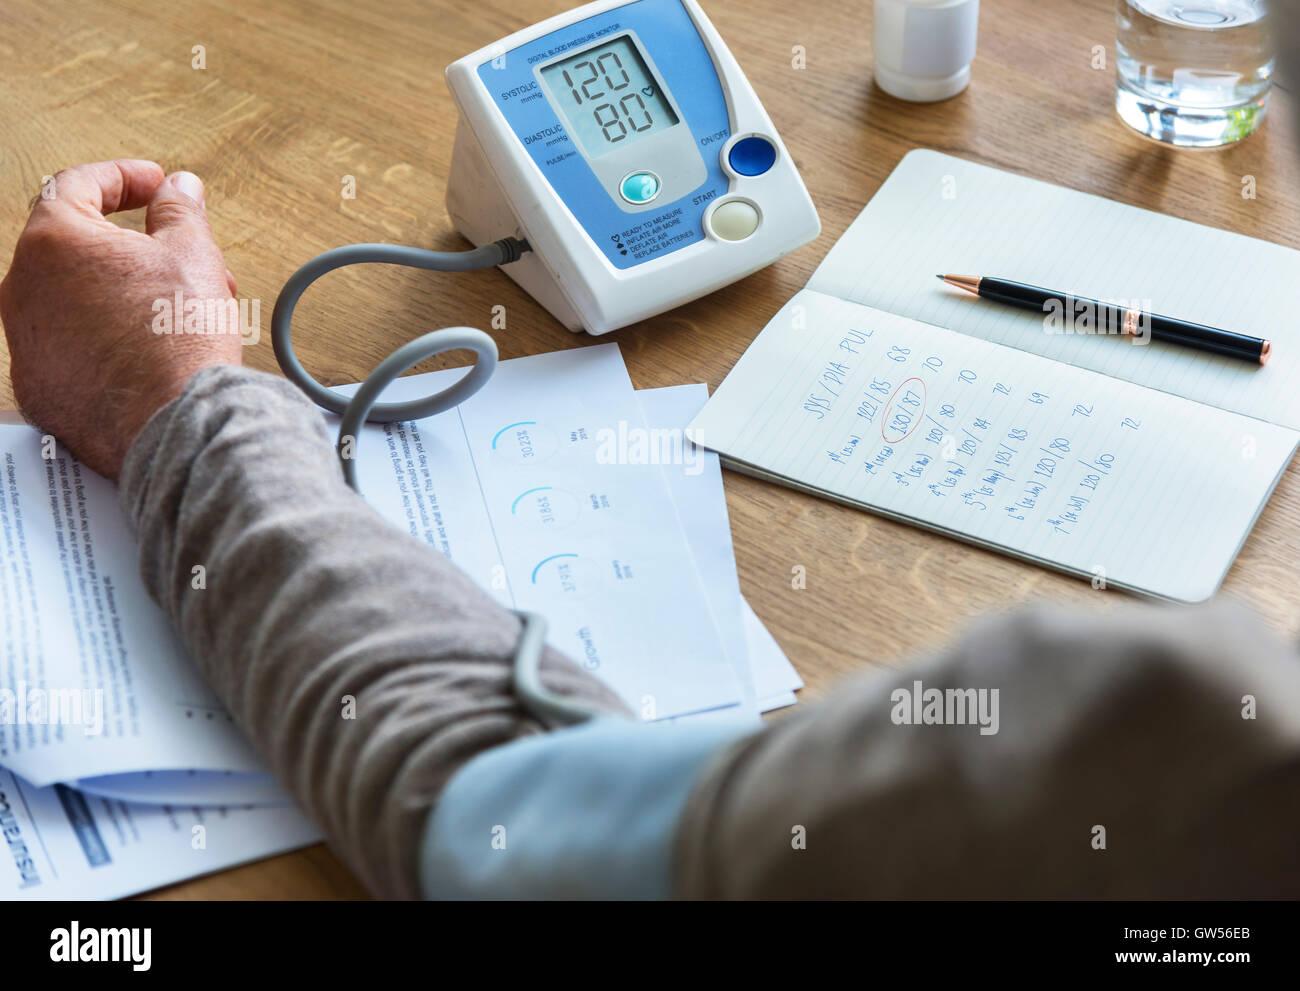 Assurance Insurance Diagnosis Health Risk Concept - Stock Image